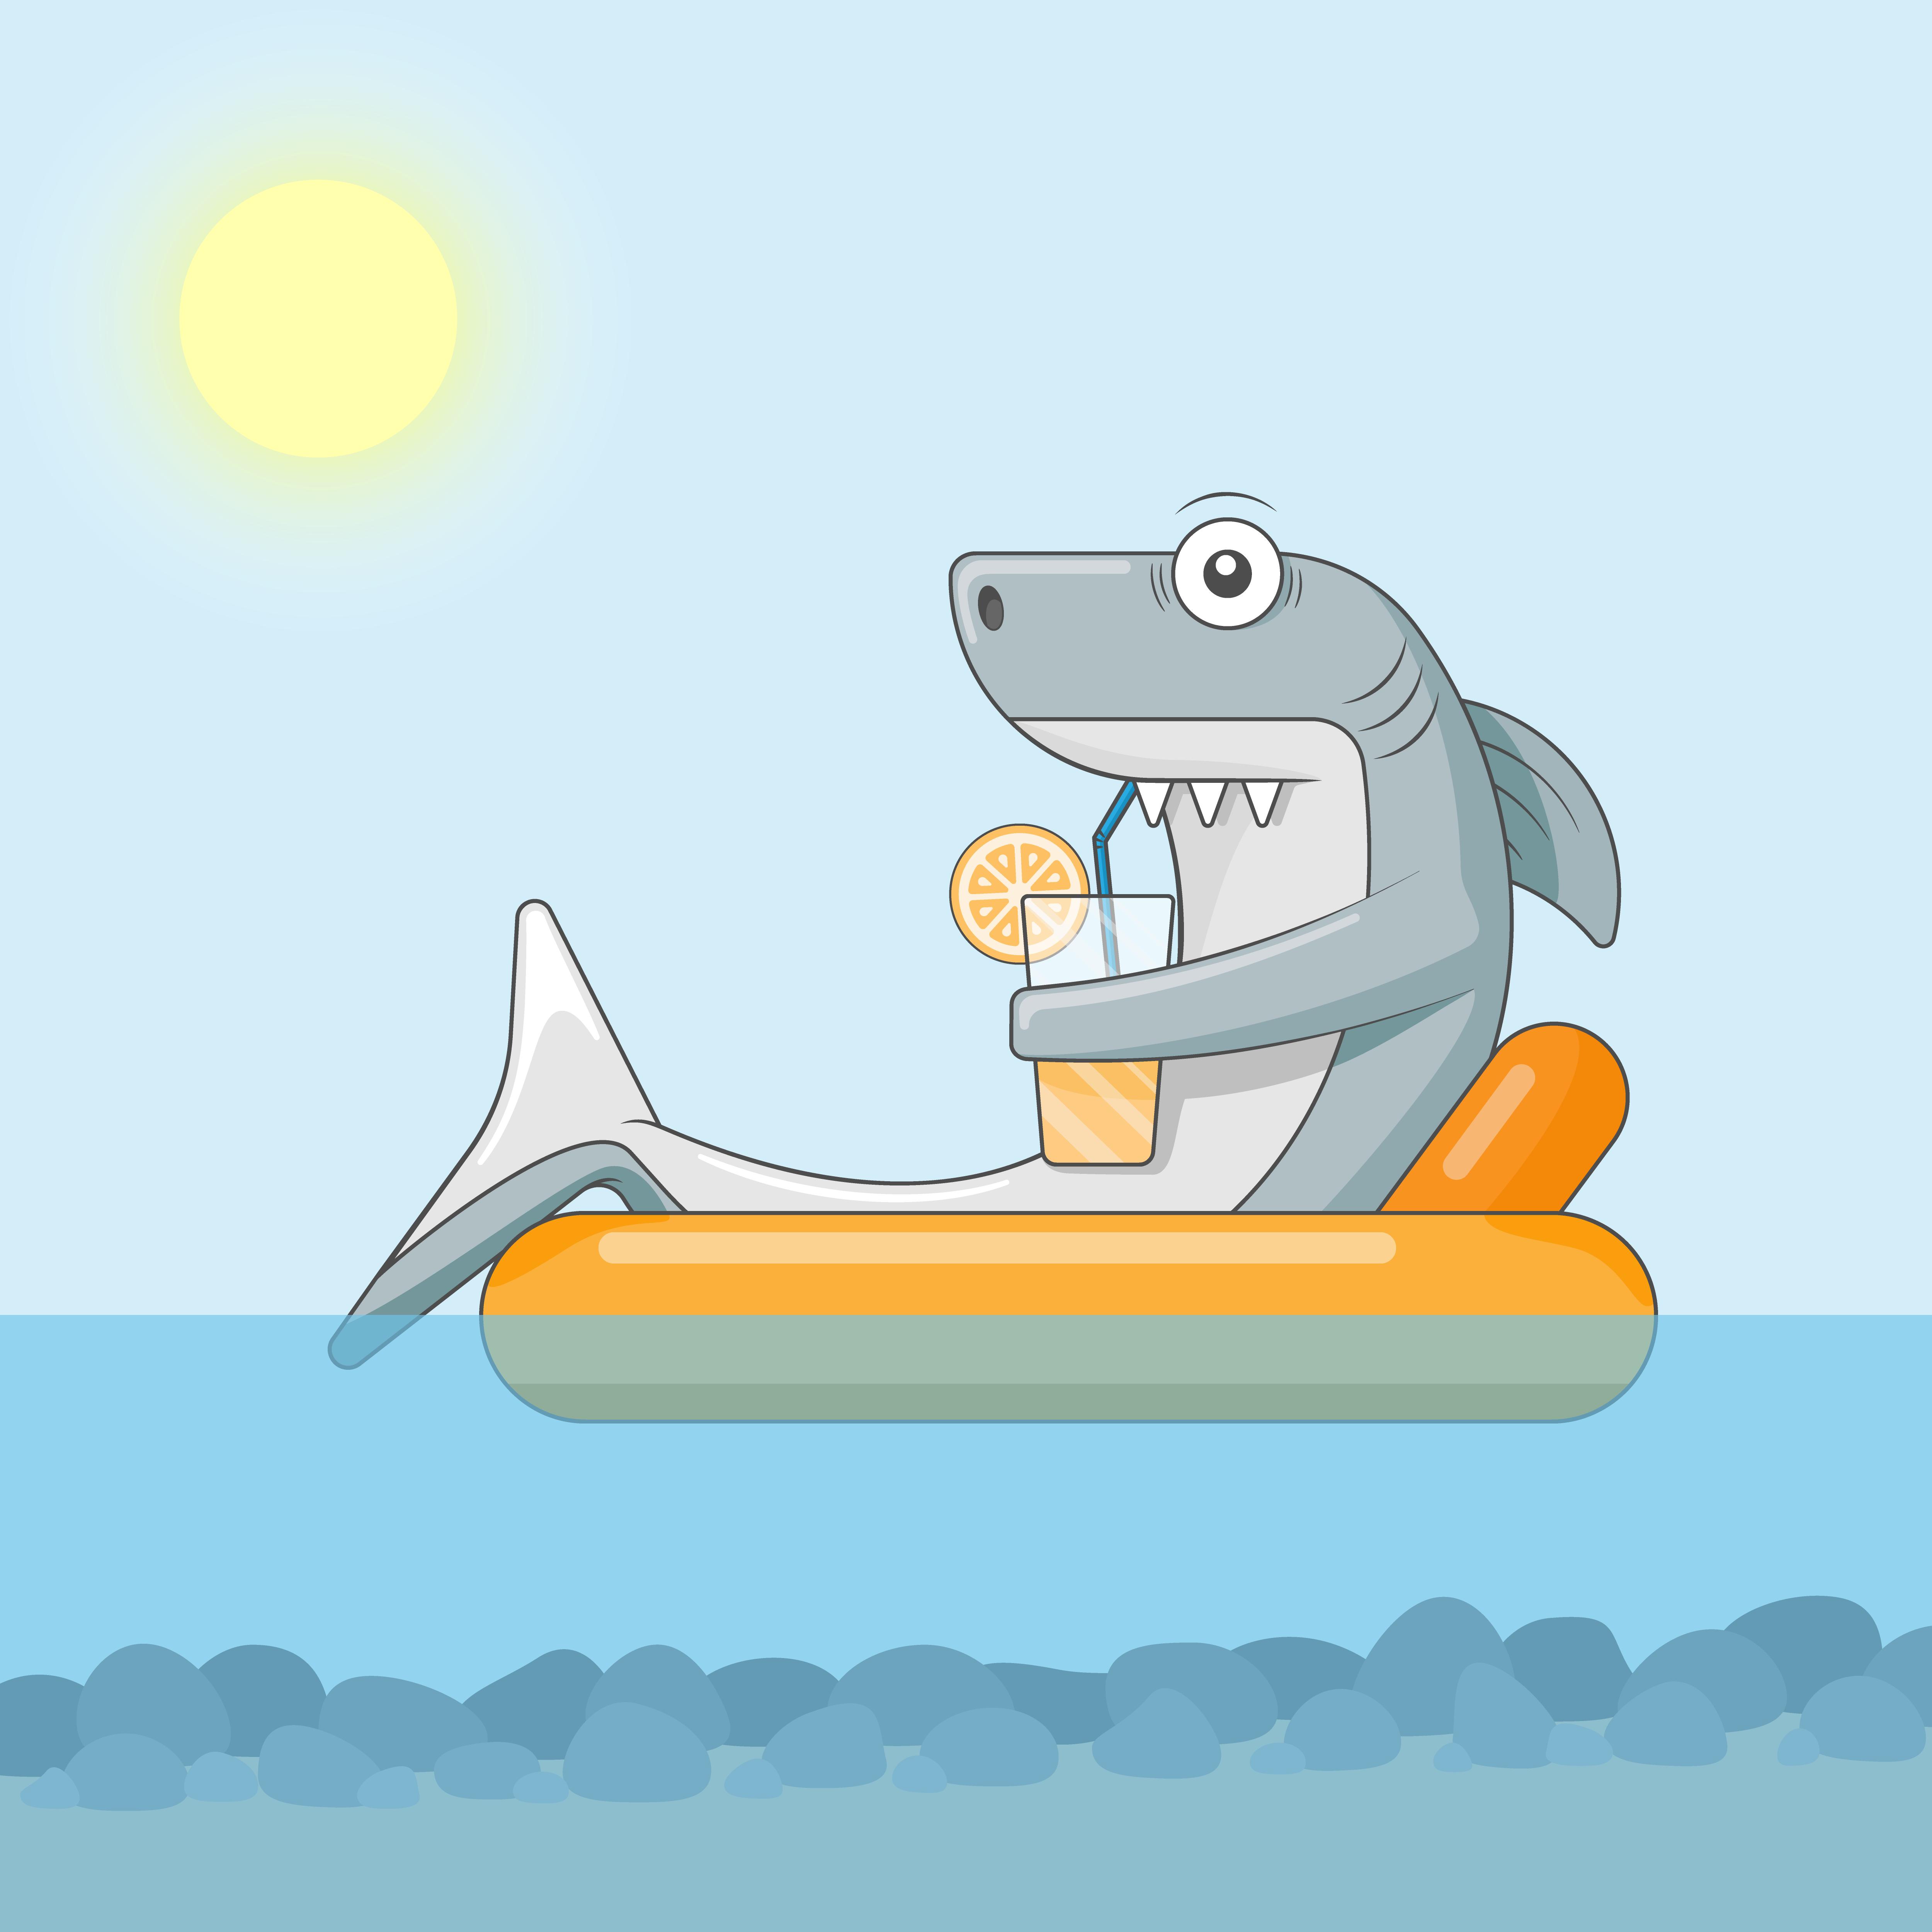 Акула отдыхает от web-программирования